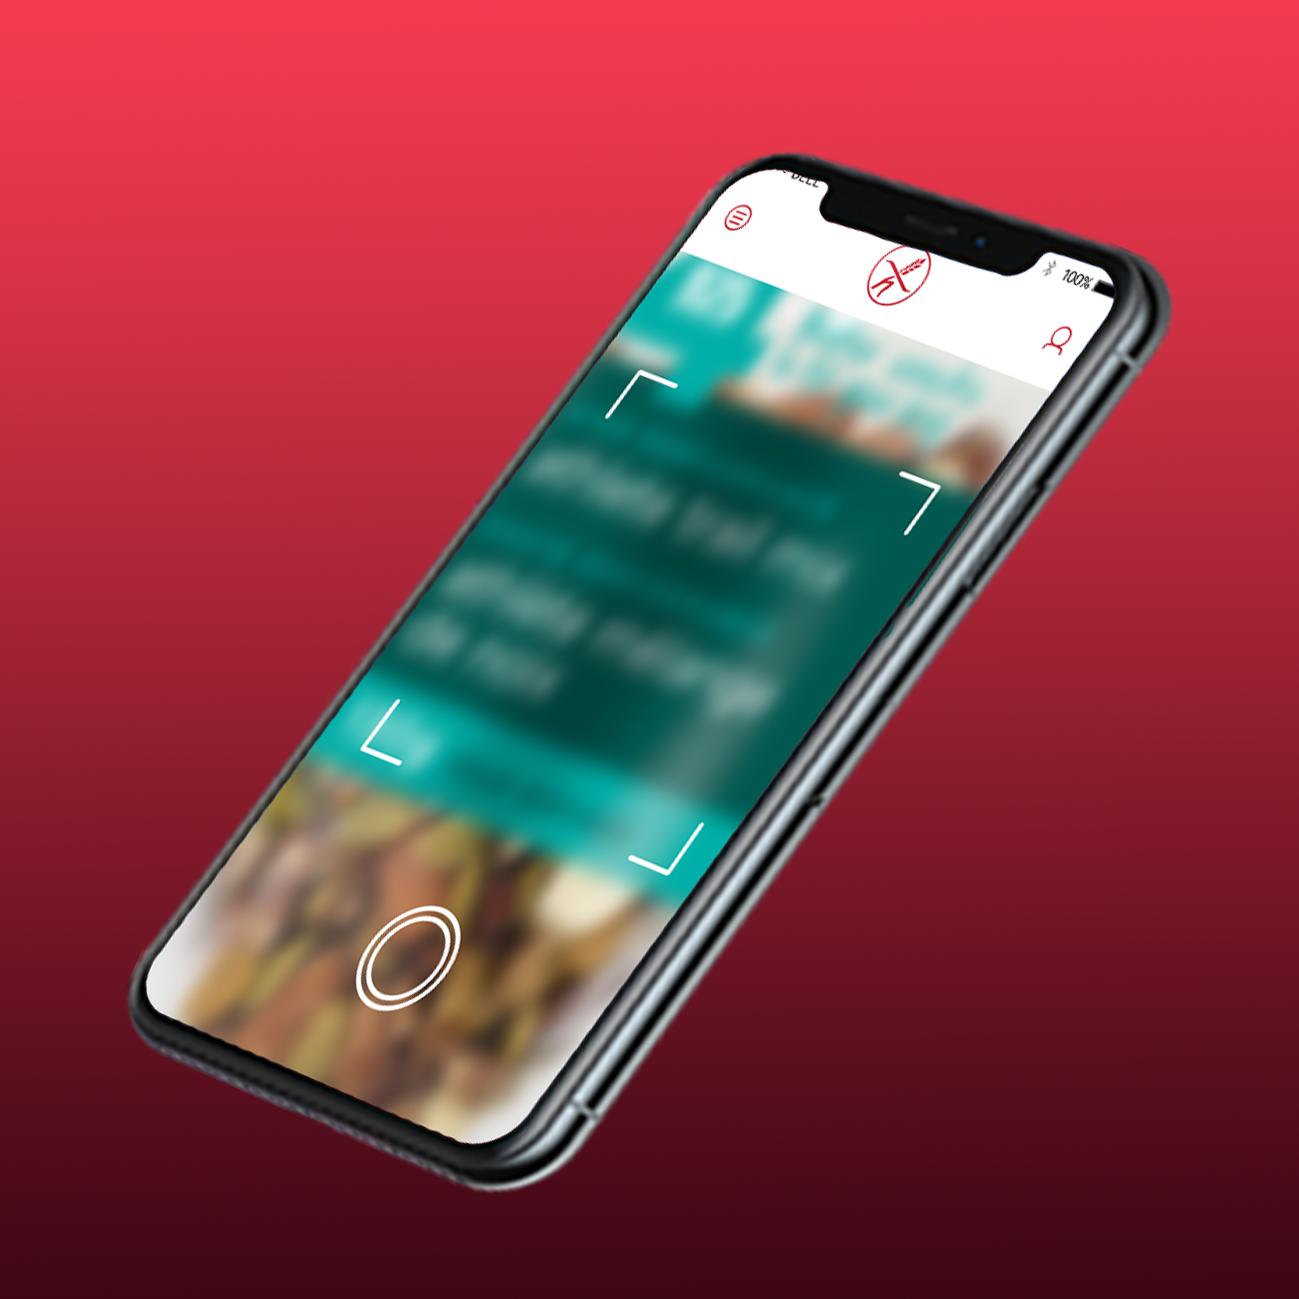 afdiag likeweb agency paris développement ios mobile android java swift cordova branding marketing